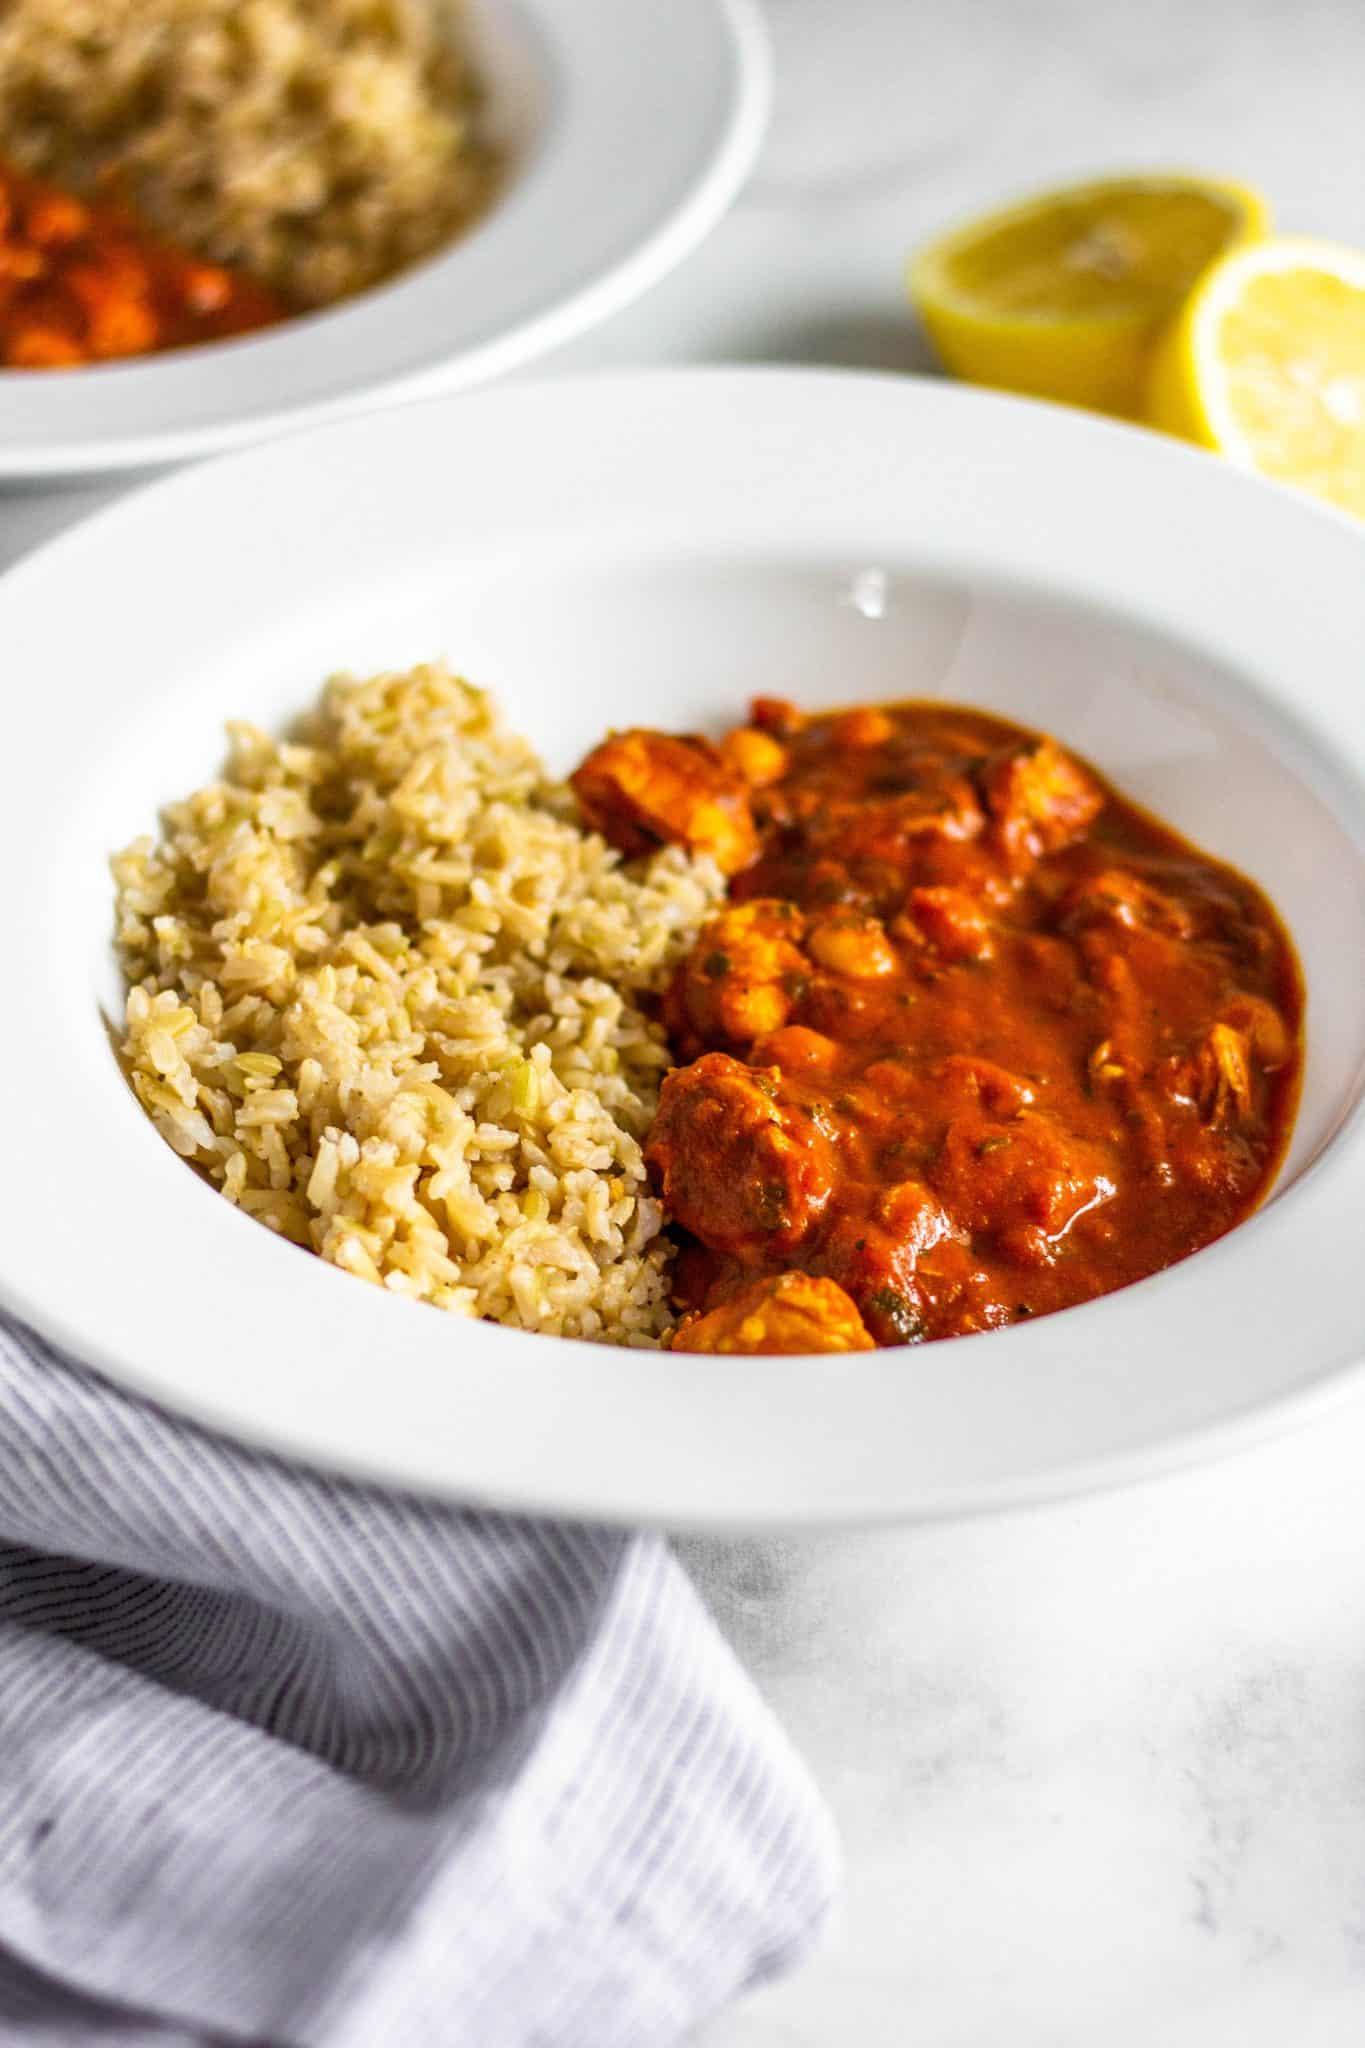 low FODMAP Chicken and Chickpea Tikka Masala #lowfodmap #healthyrecipe #tararochfordnutrition